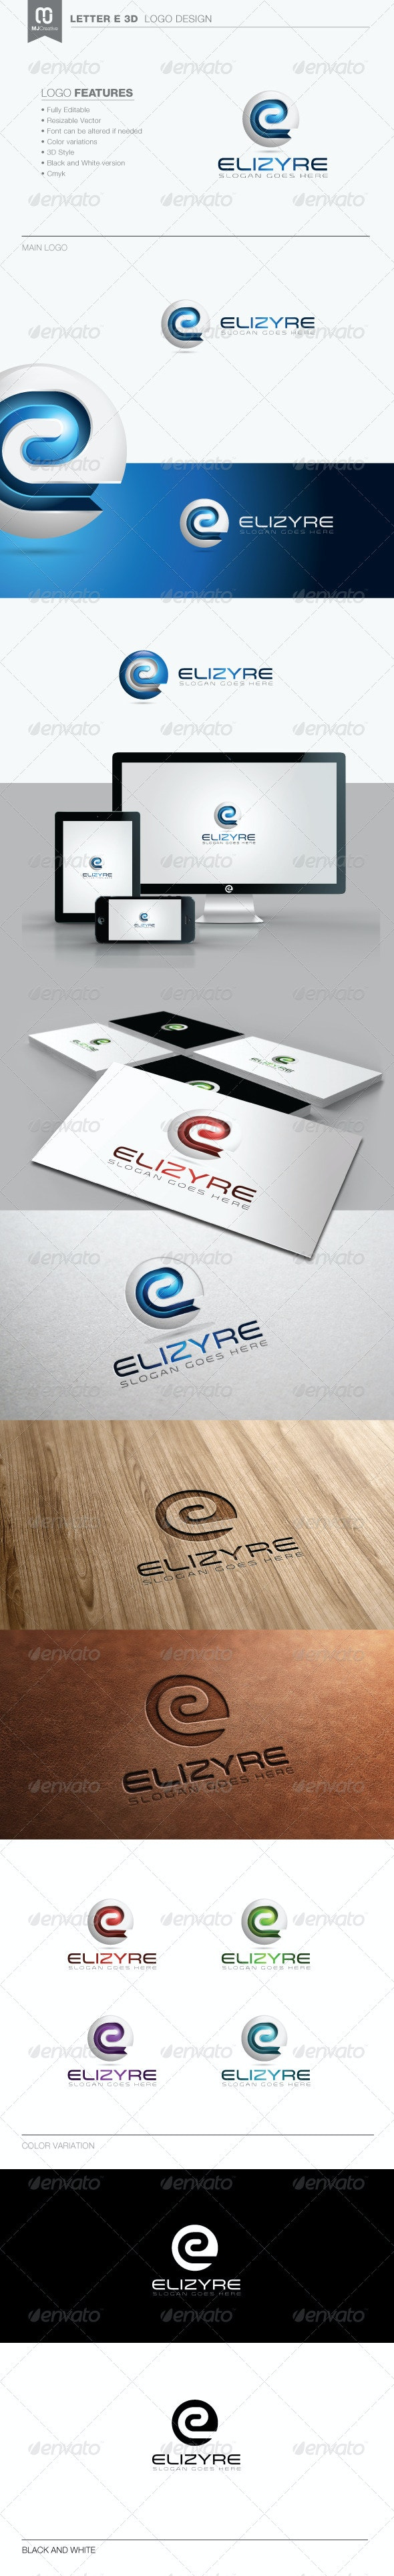 Letter E 3D Logo - 3d Abstract